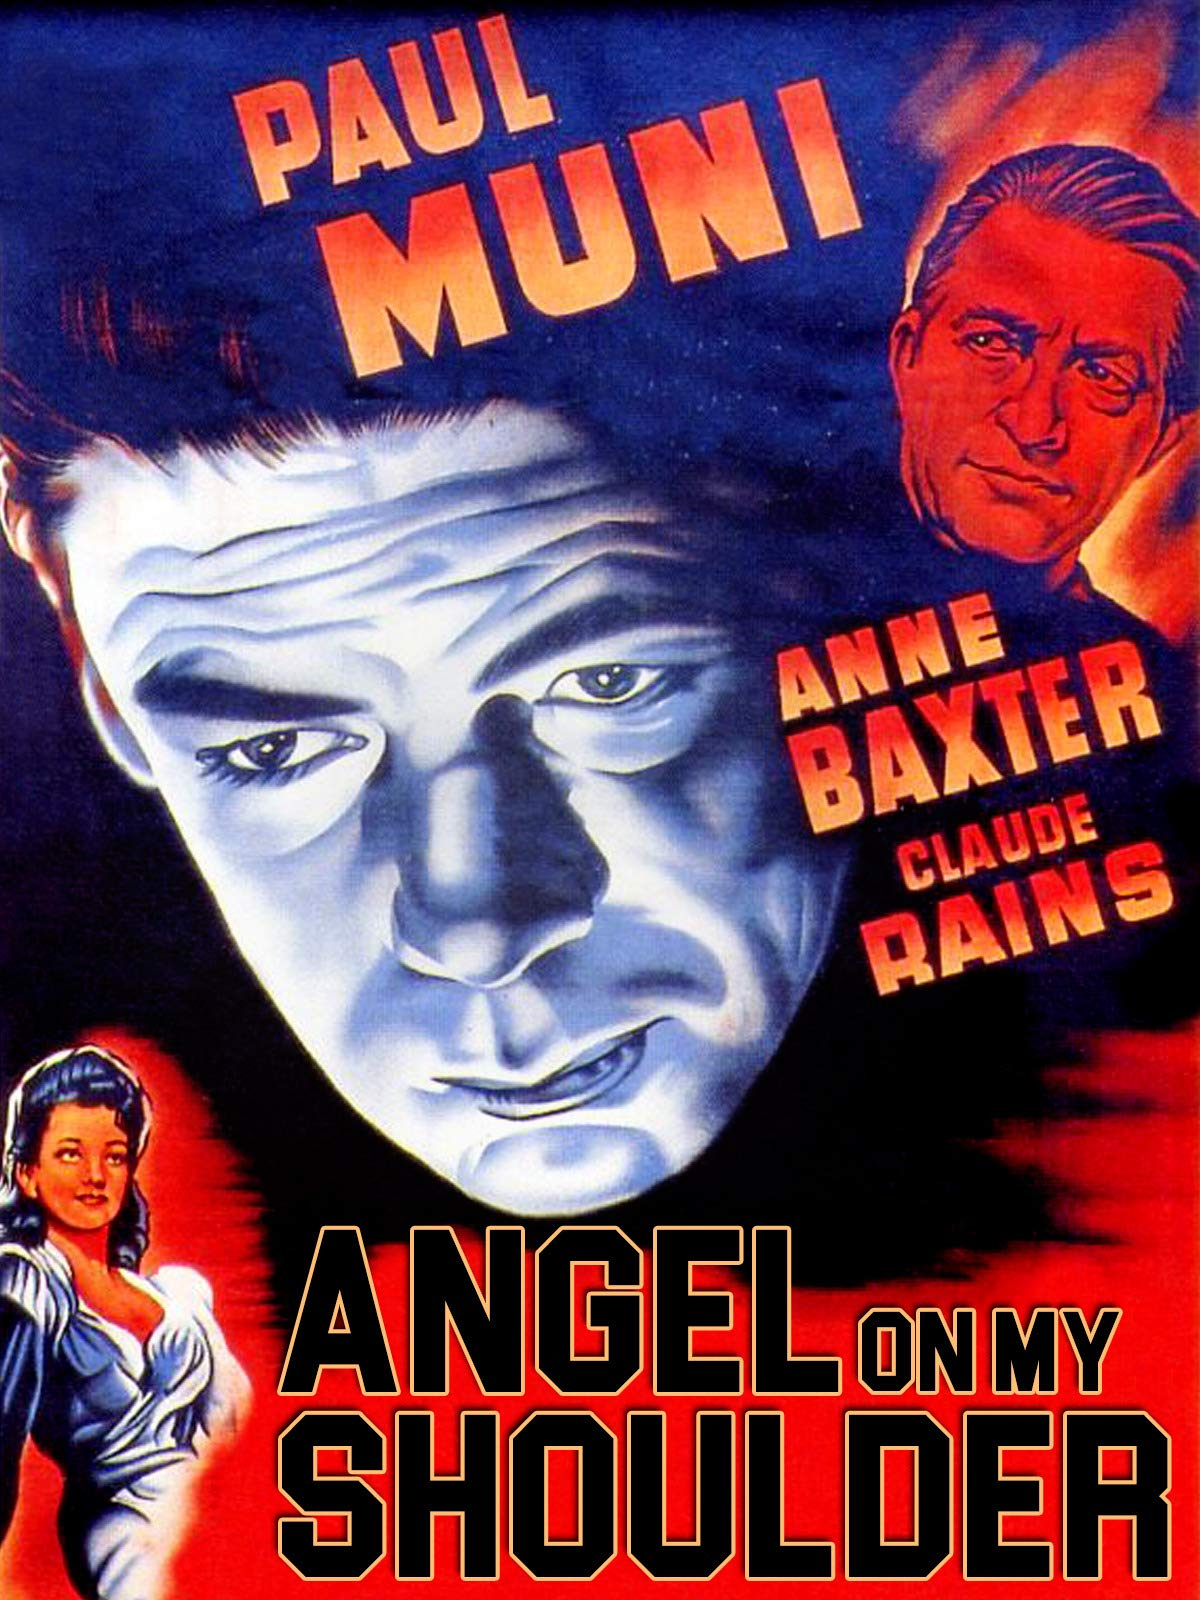 Angel On My Shoulder - Paul Muni, Anne Baxter, Claude Rains